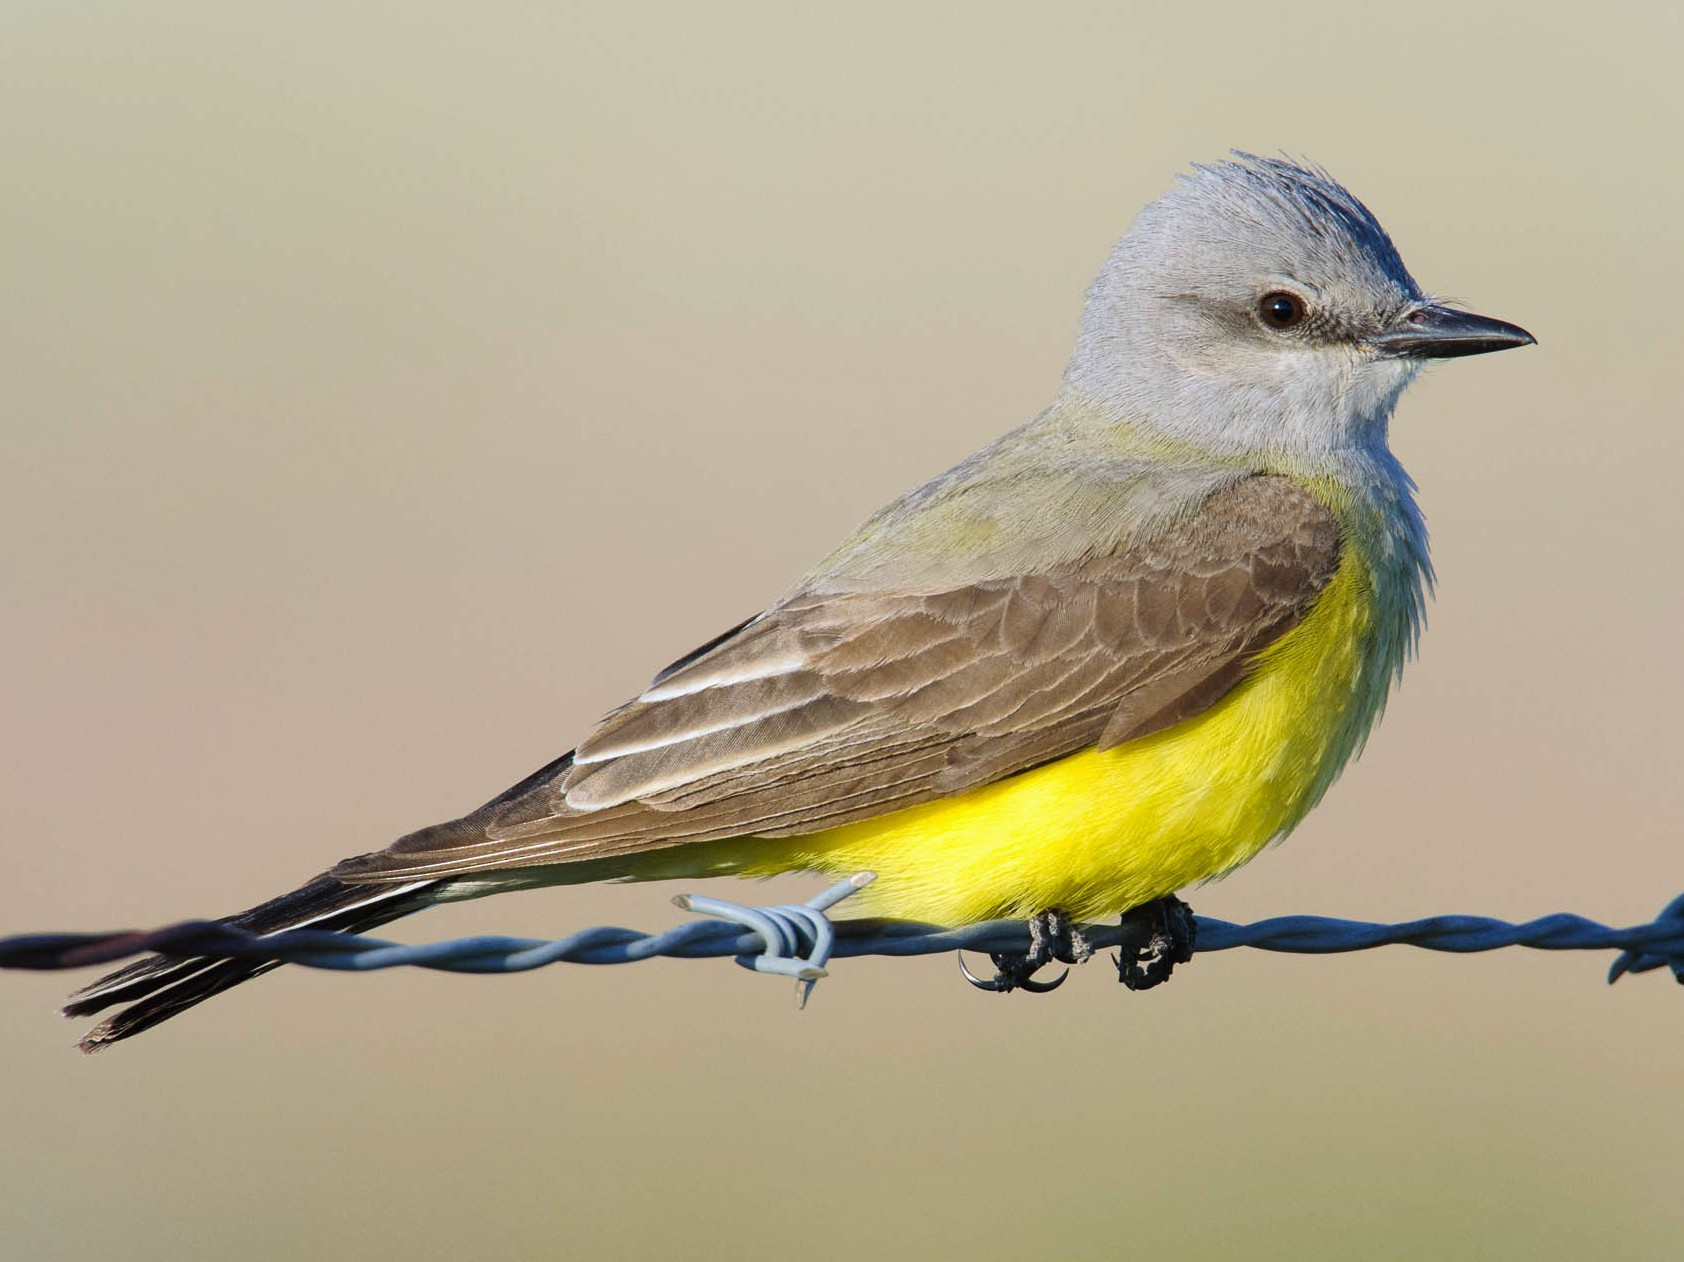 Western Kingbird - Gerrit Vyn